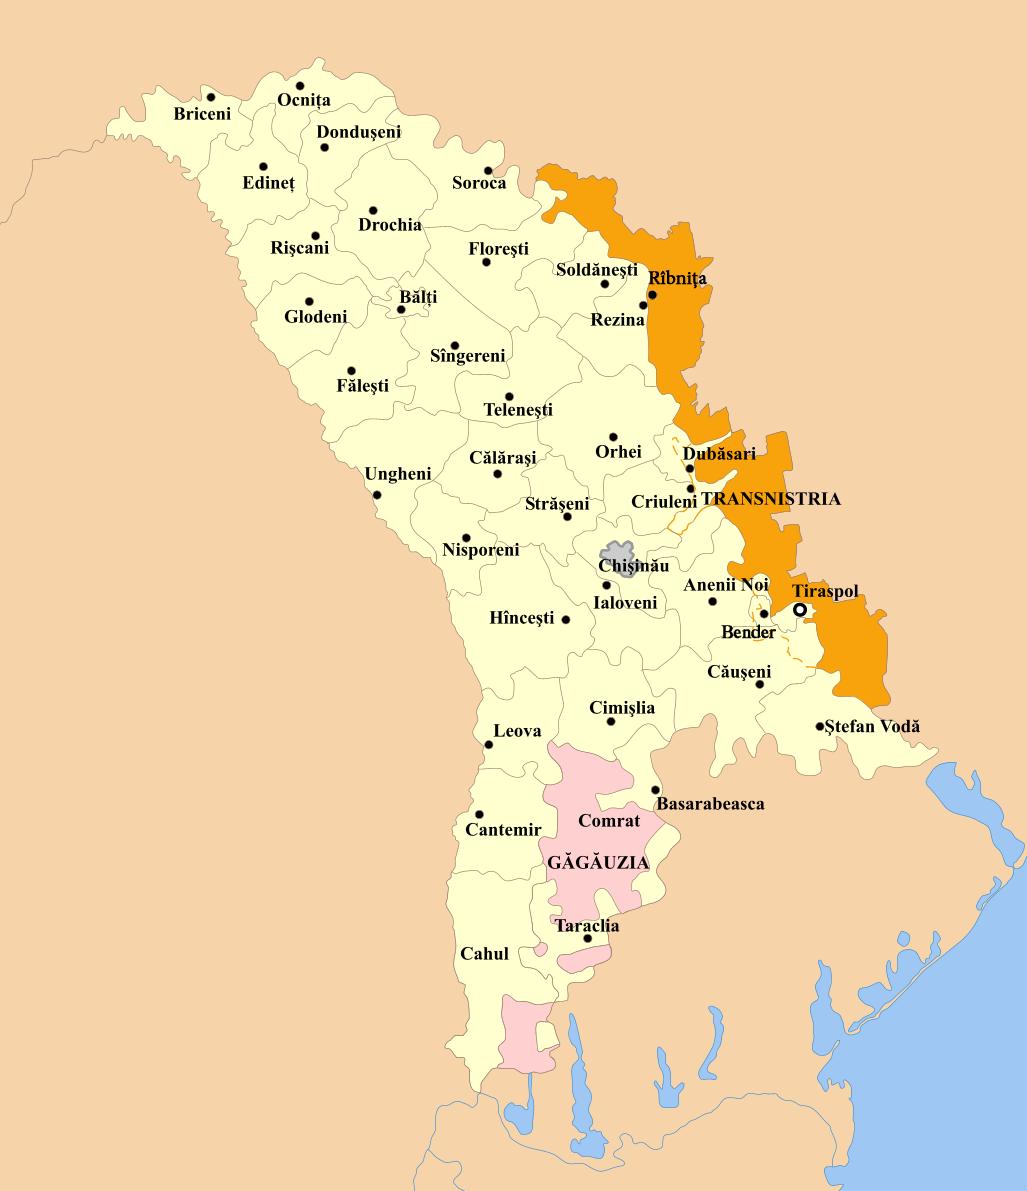 https://upload.wikimedia.org/wikipedia/commons/c/c6/Moldadm.png